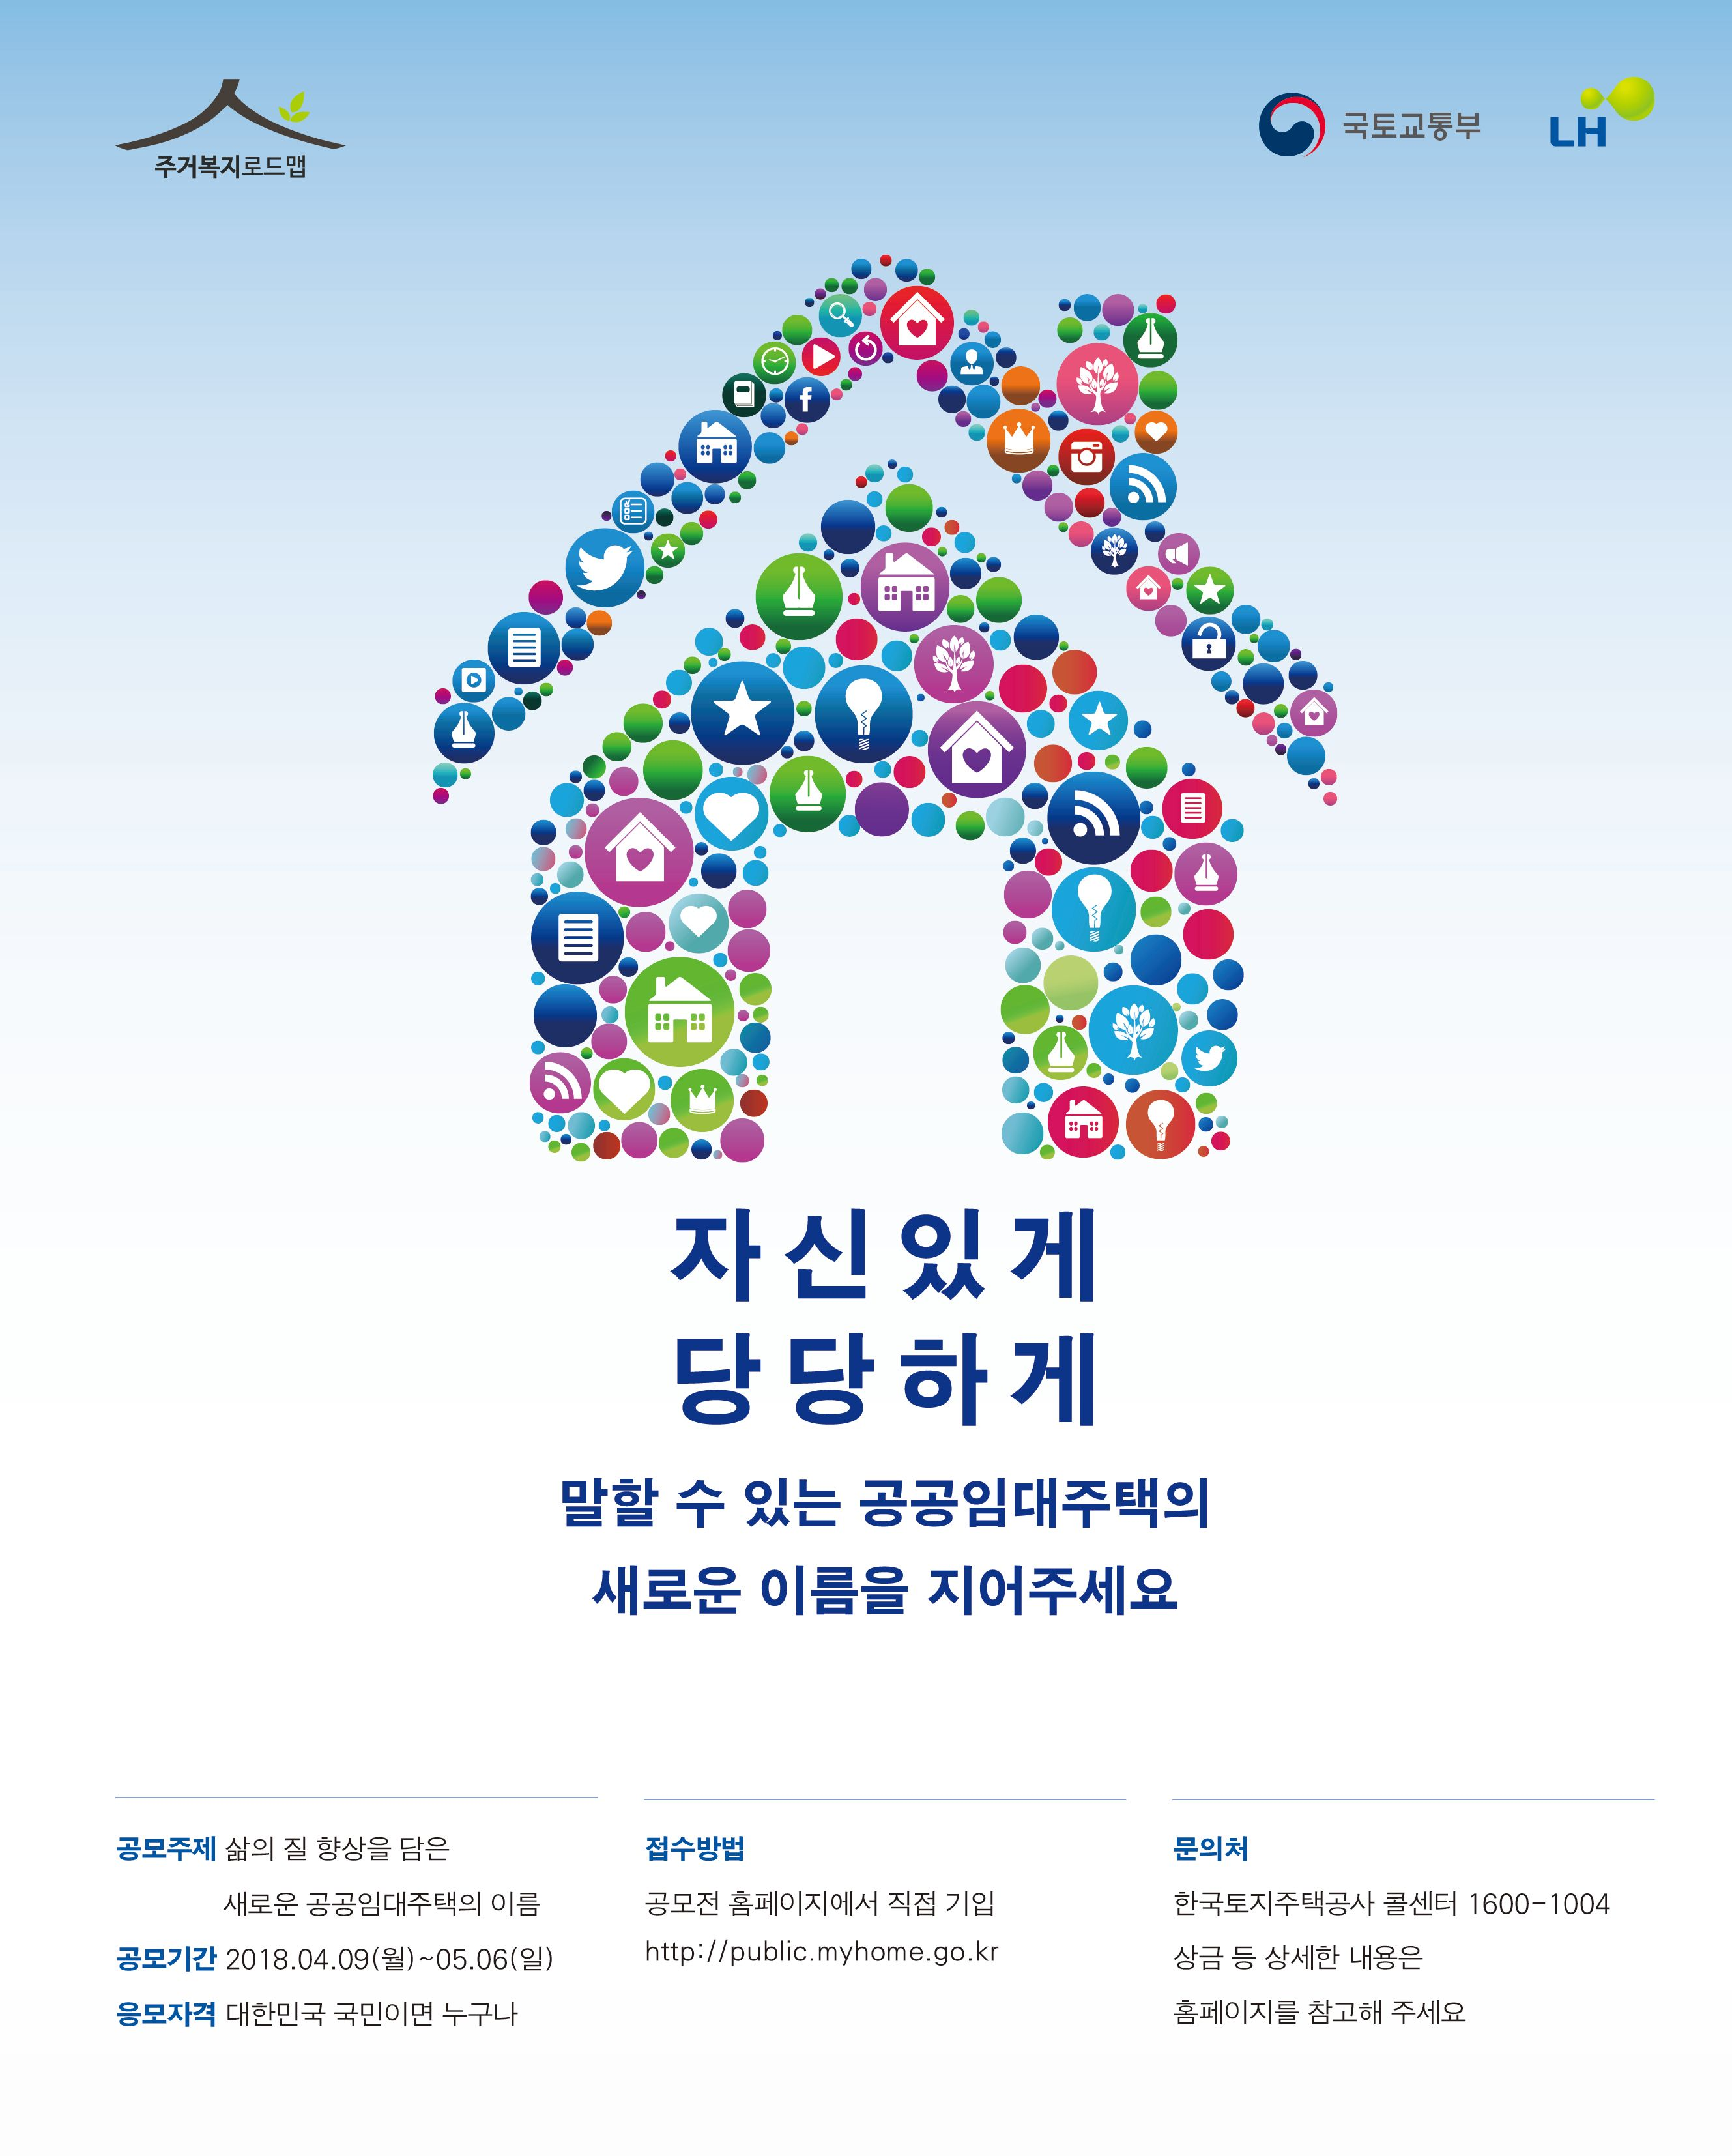 [LH한국토지주택공사] 공공임대주택 네이밍 공모전